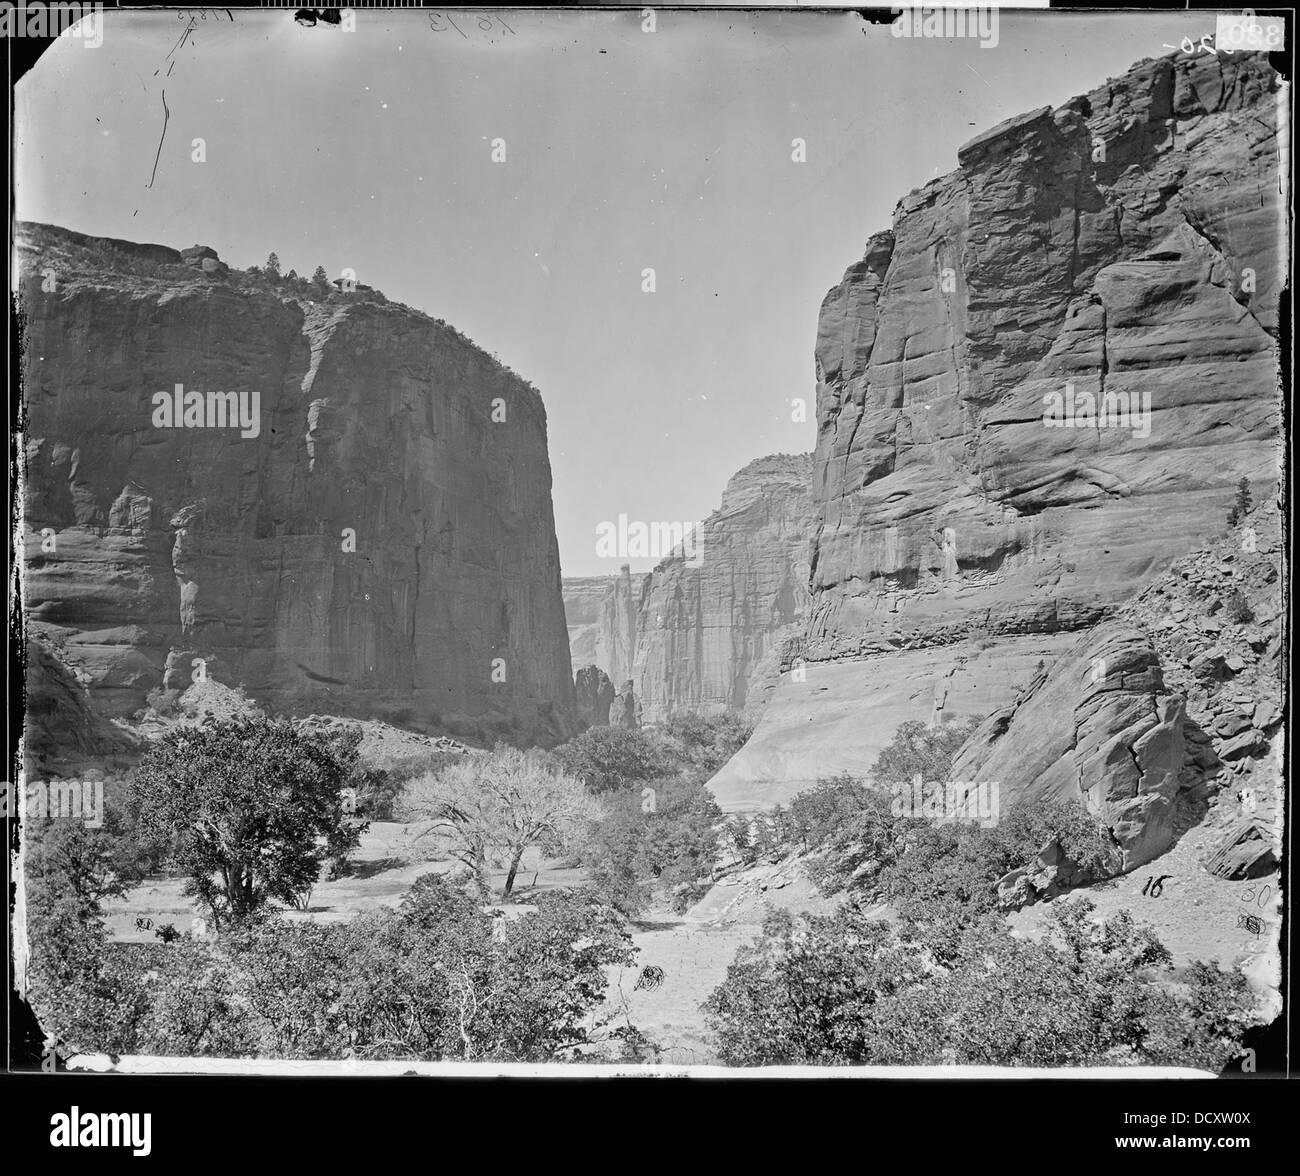 HEAD OF CANYON DE CHELLE, LOOKING DOWN WALLS 1200 FEET IN HEIGHT, ARIZONA - - 524271 Stock Photo